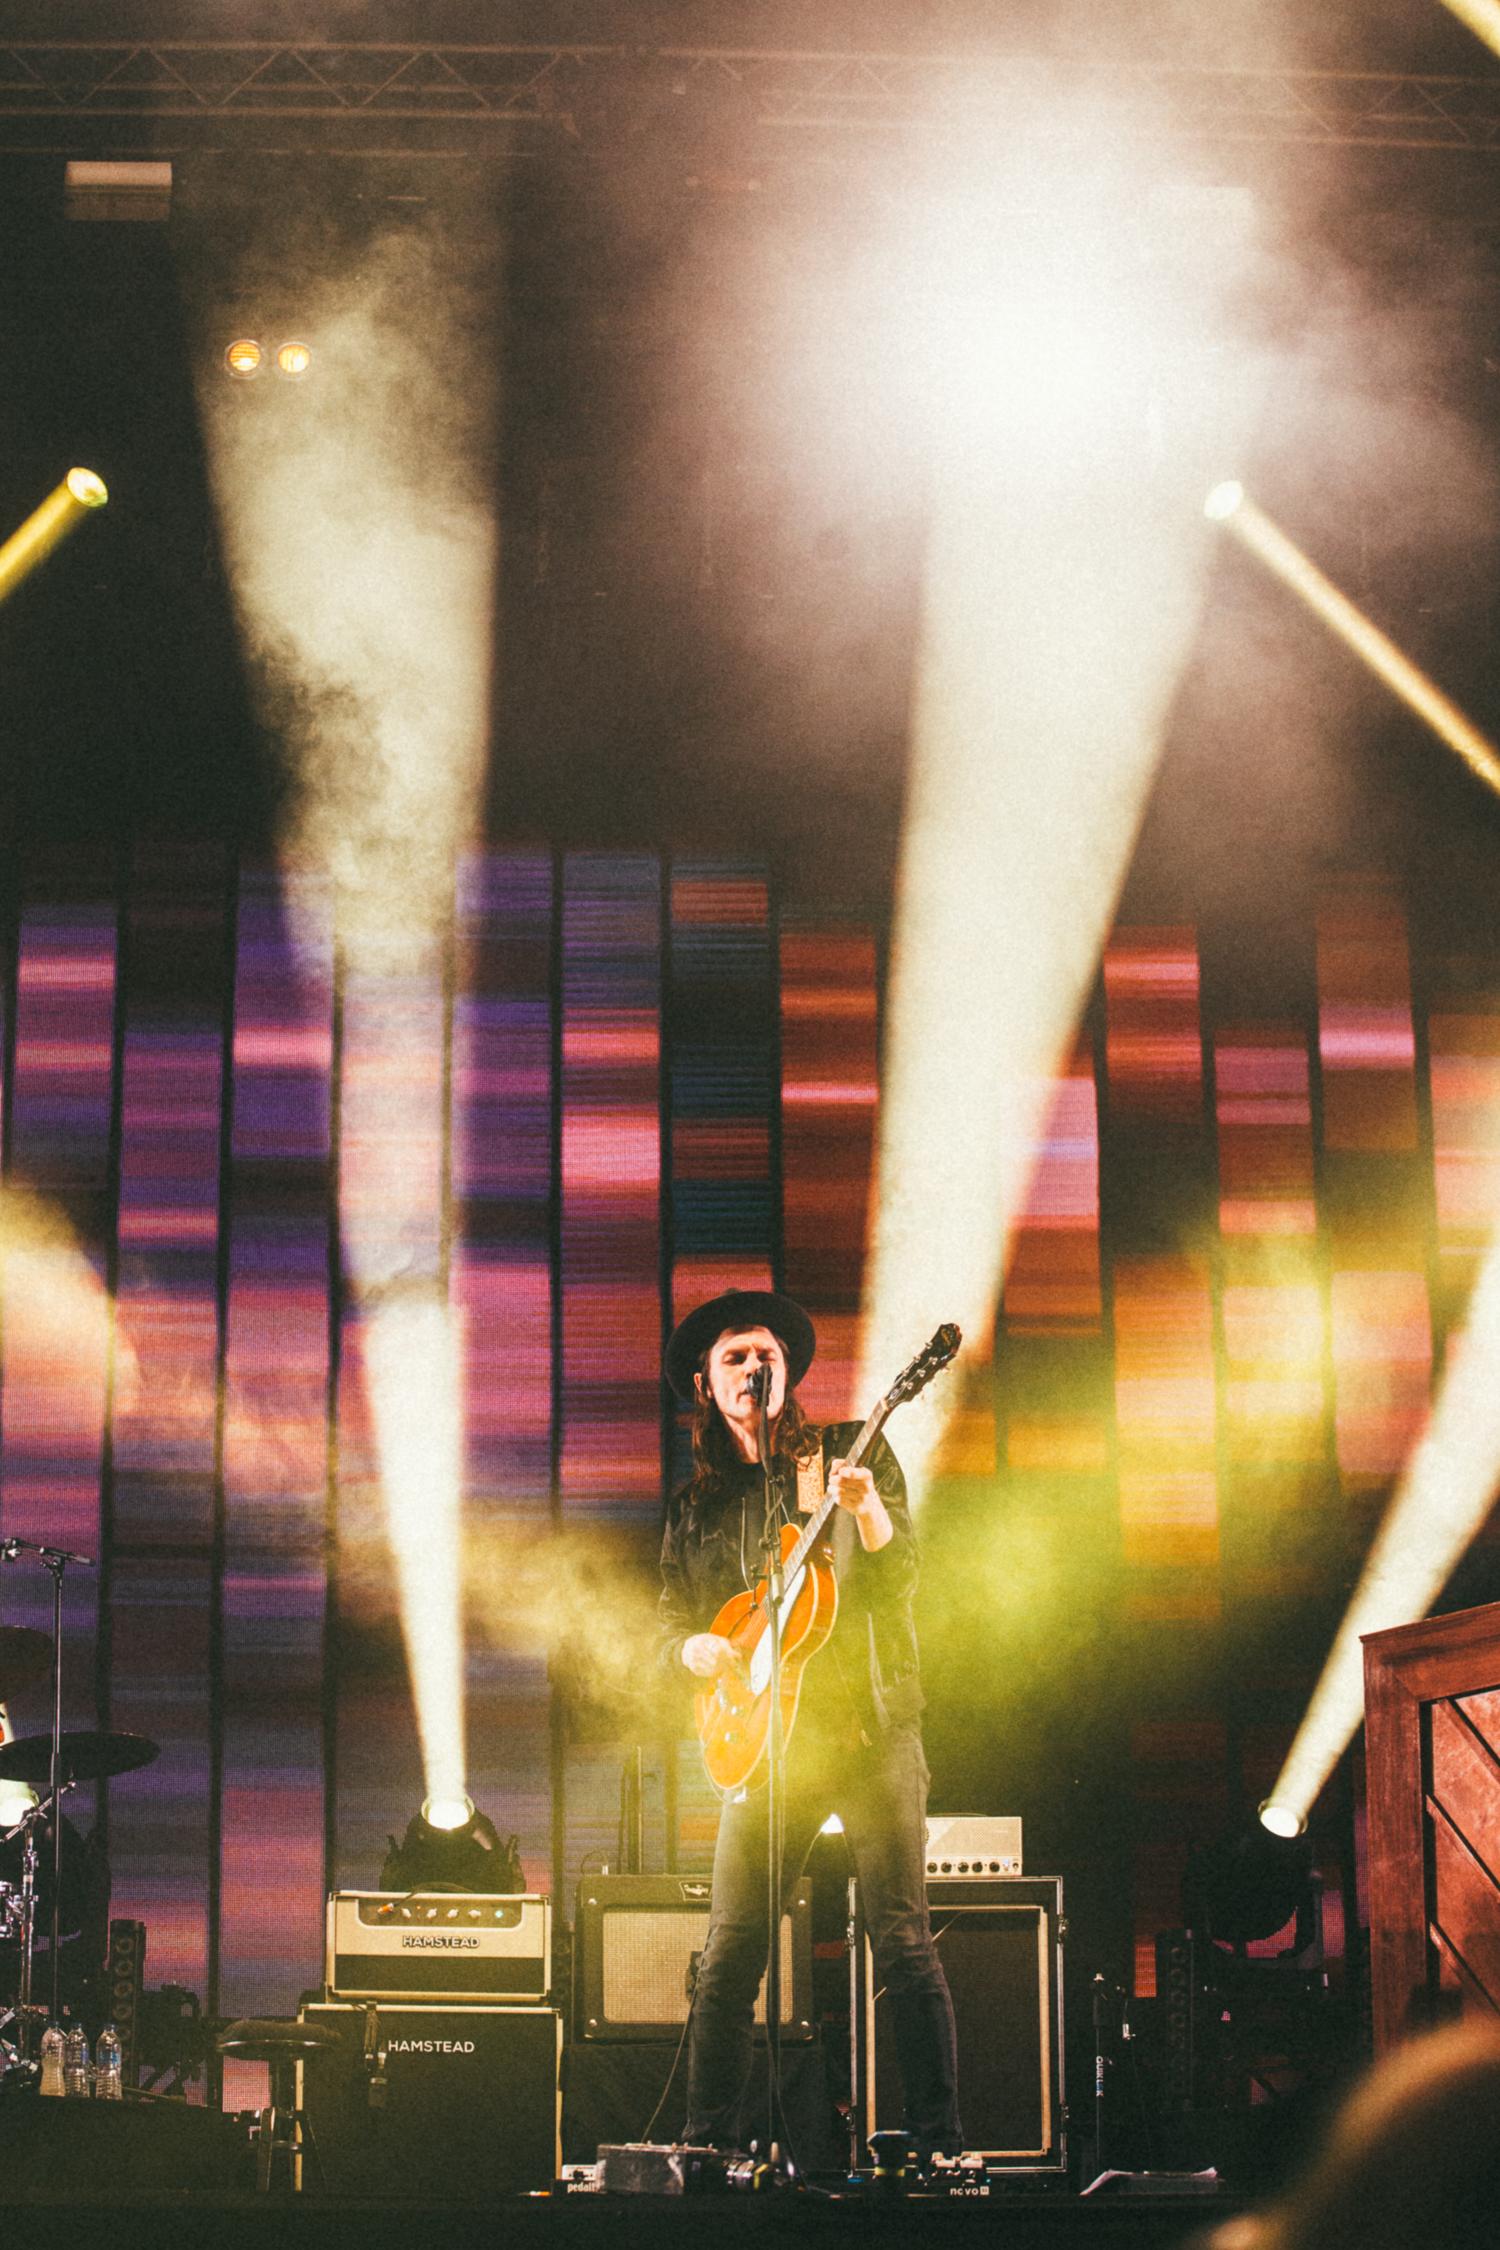 James-Bay-Live-Boardmasters-Music-Concert-Darina-Stoda-Photography-Photographer-16.jpg